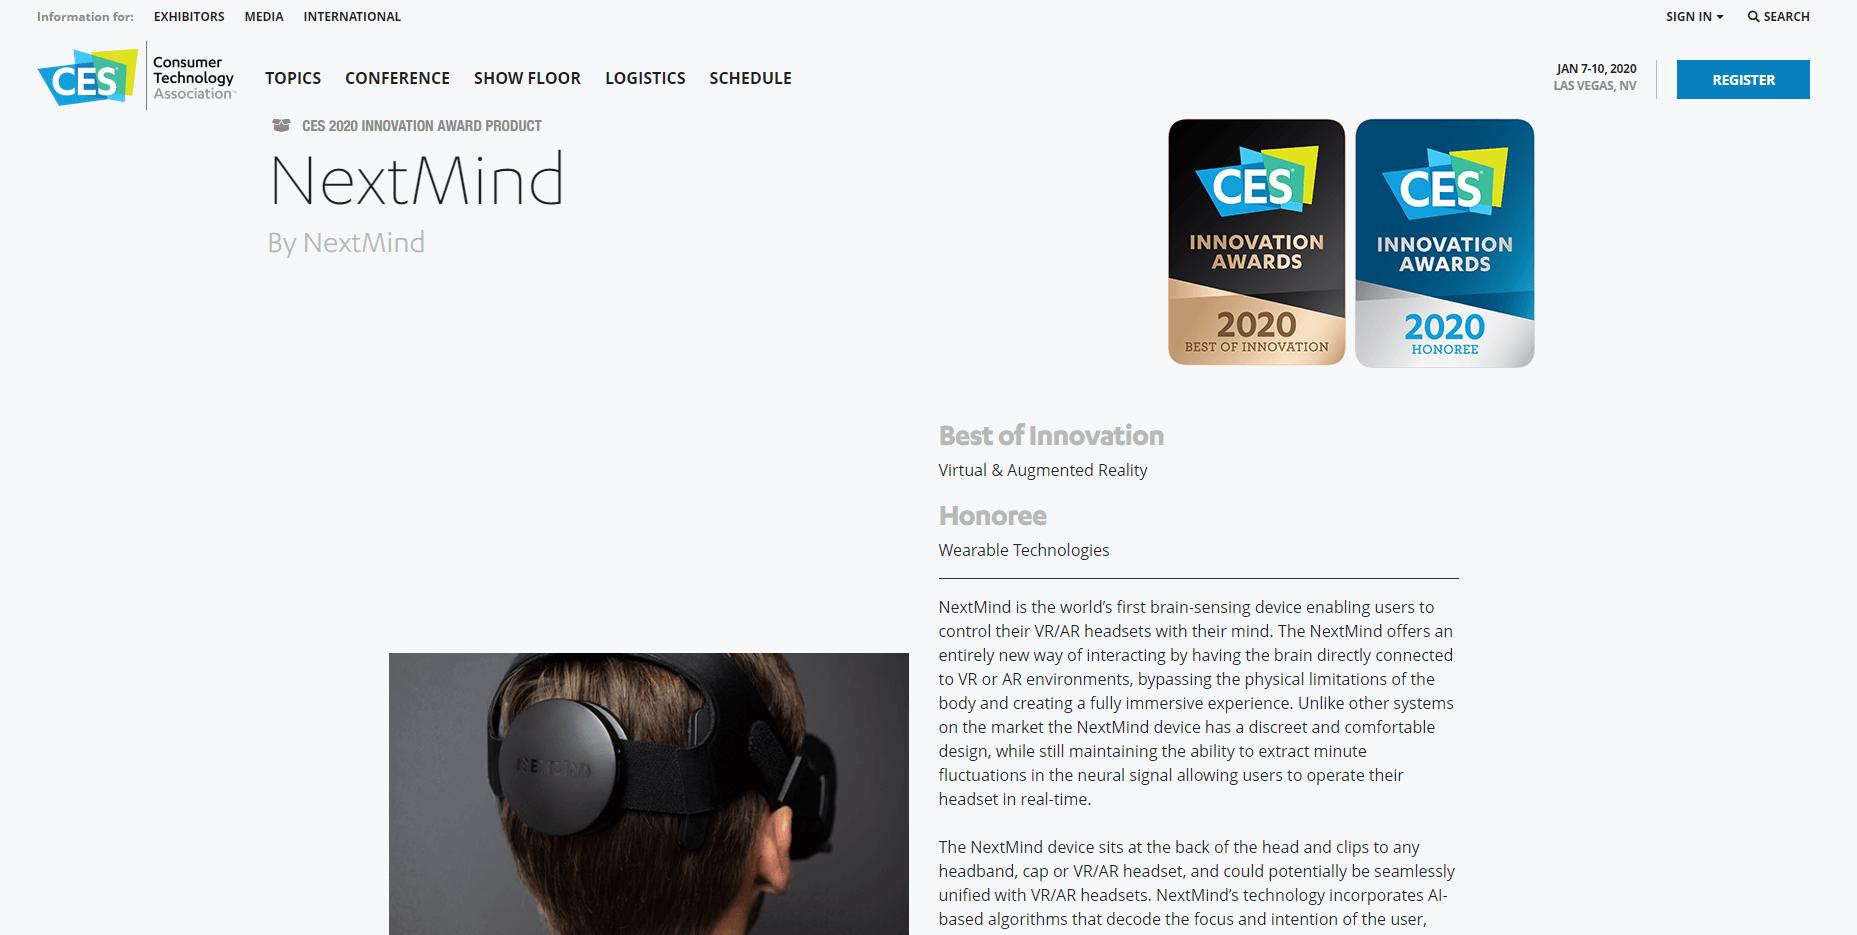 Dev Kit product by the NextMind - CES 2020